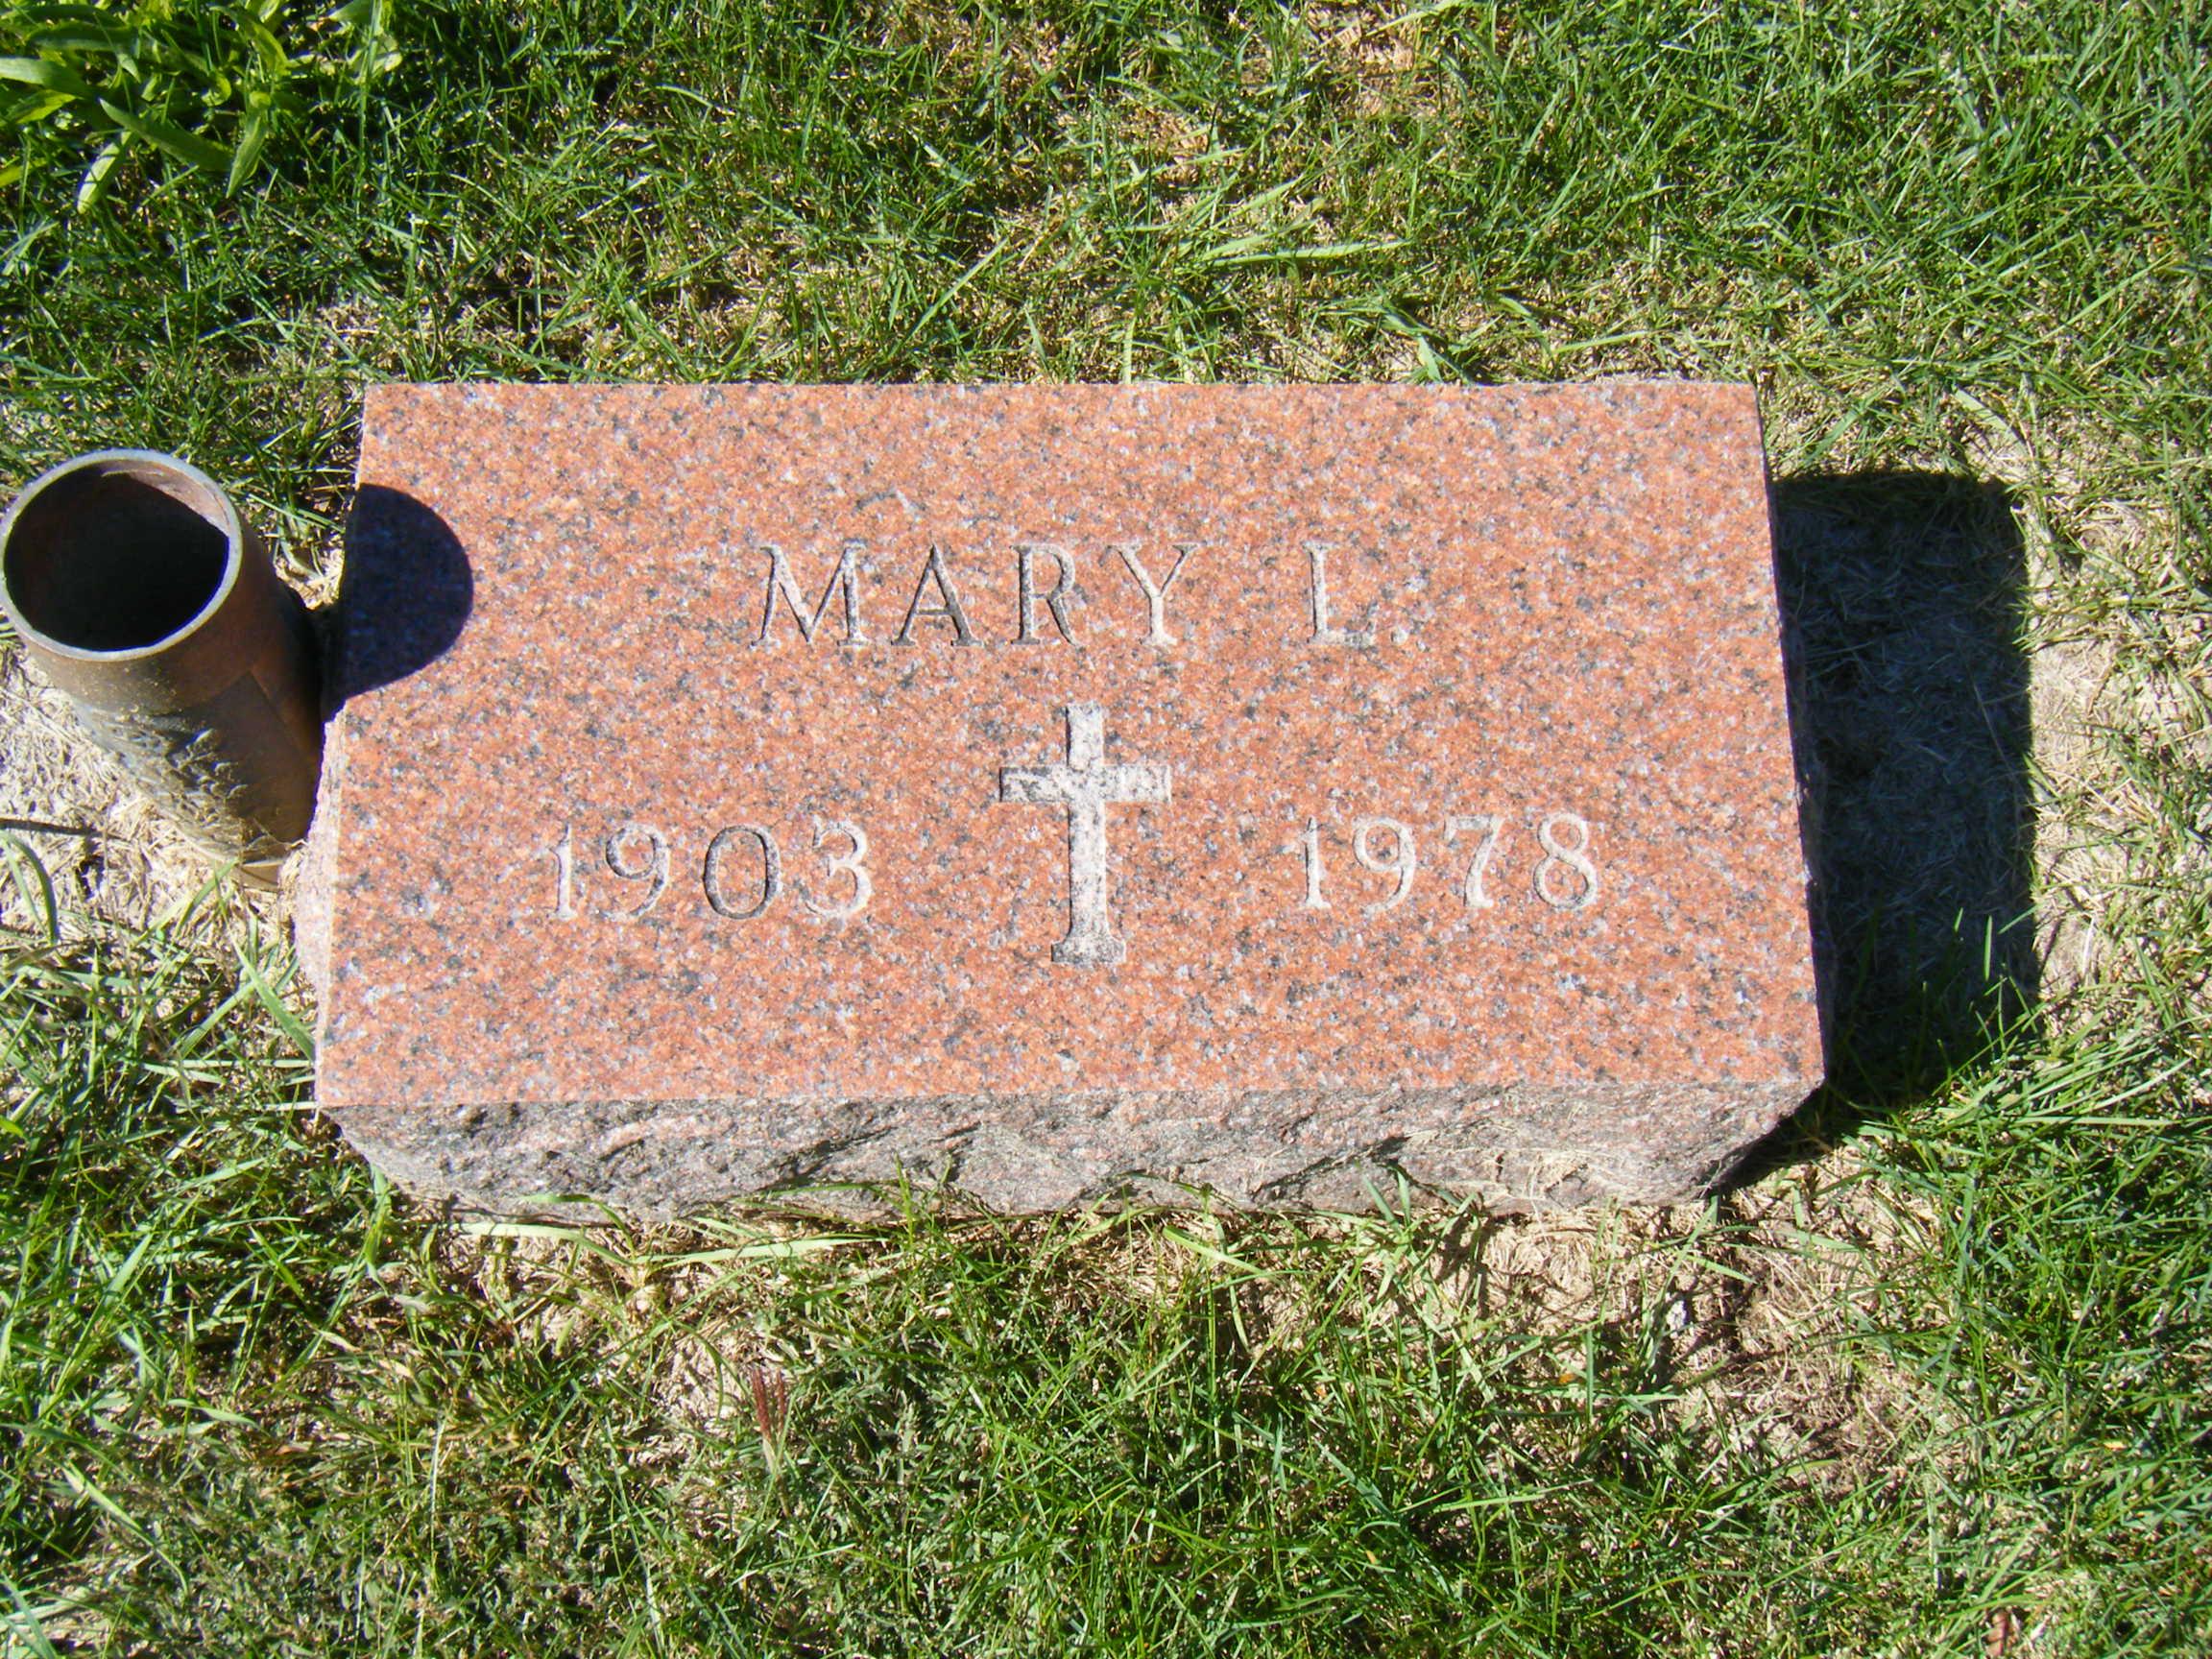 Mary Louise Hansman